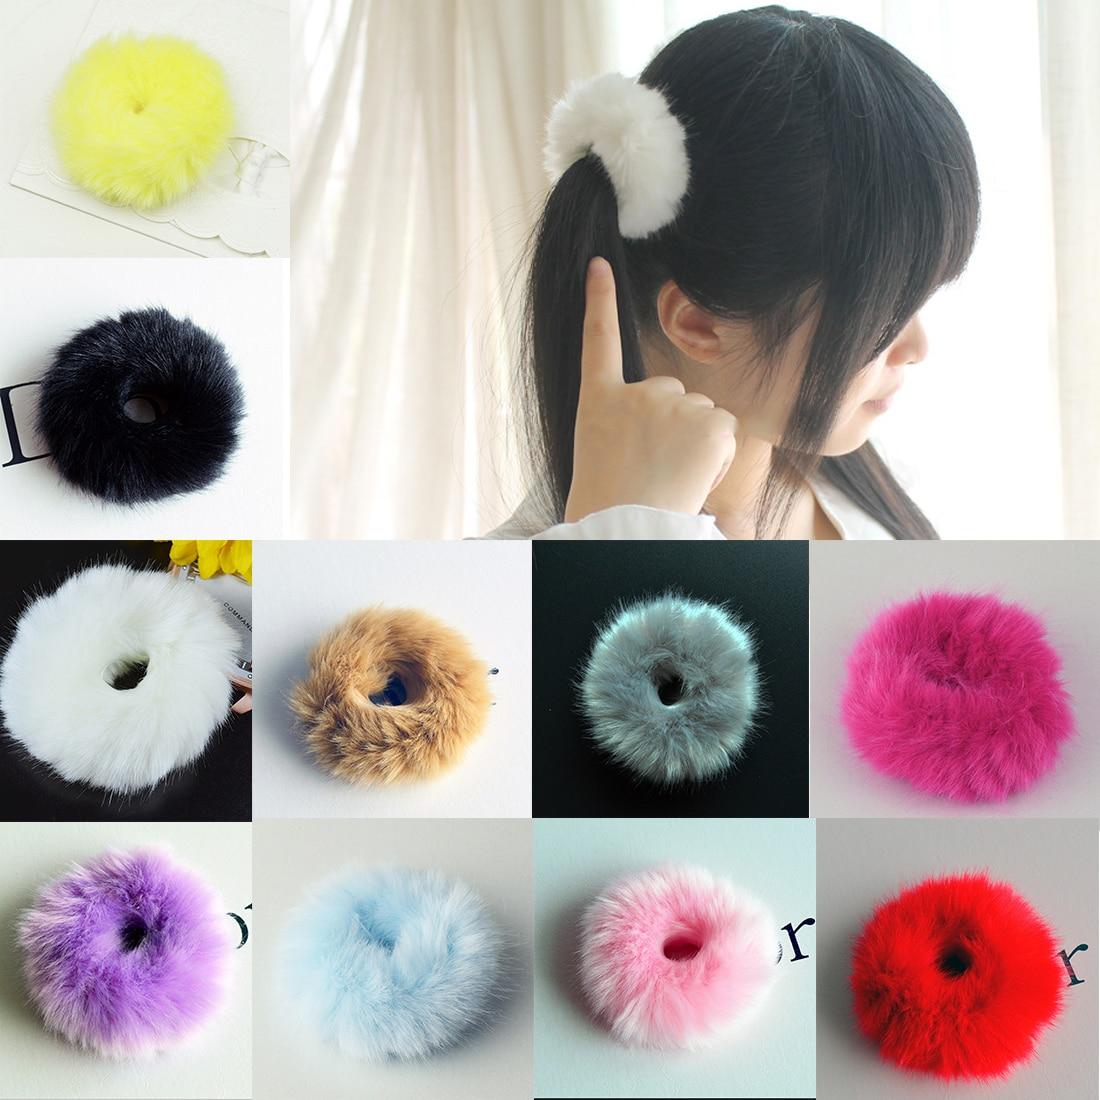 2pcs Cute   Headwear   Set Trendy Soft Women Girls Hairband Fake Rabbit Fur Elastic Hair Bands Girls Hair Accessories Cute RabbitRub